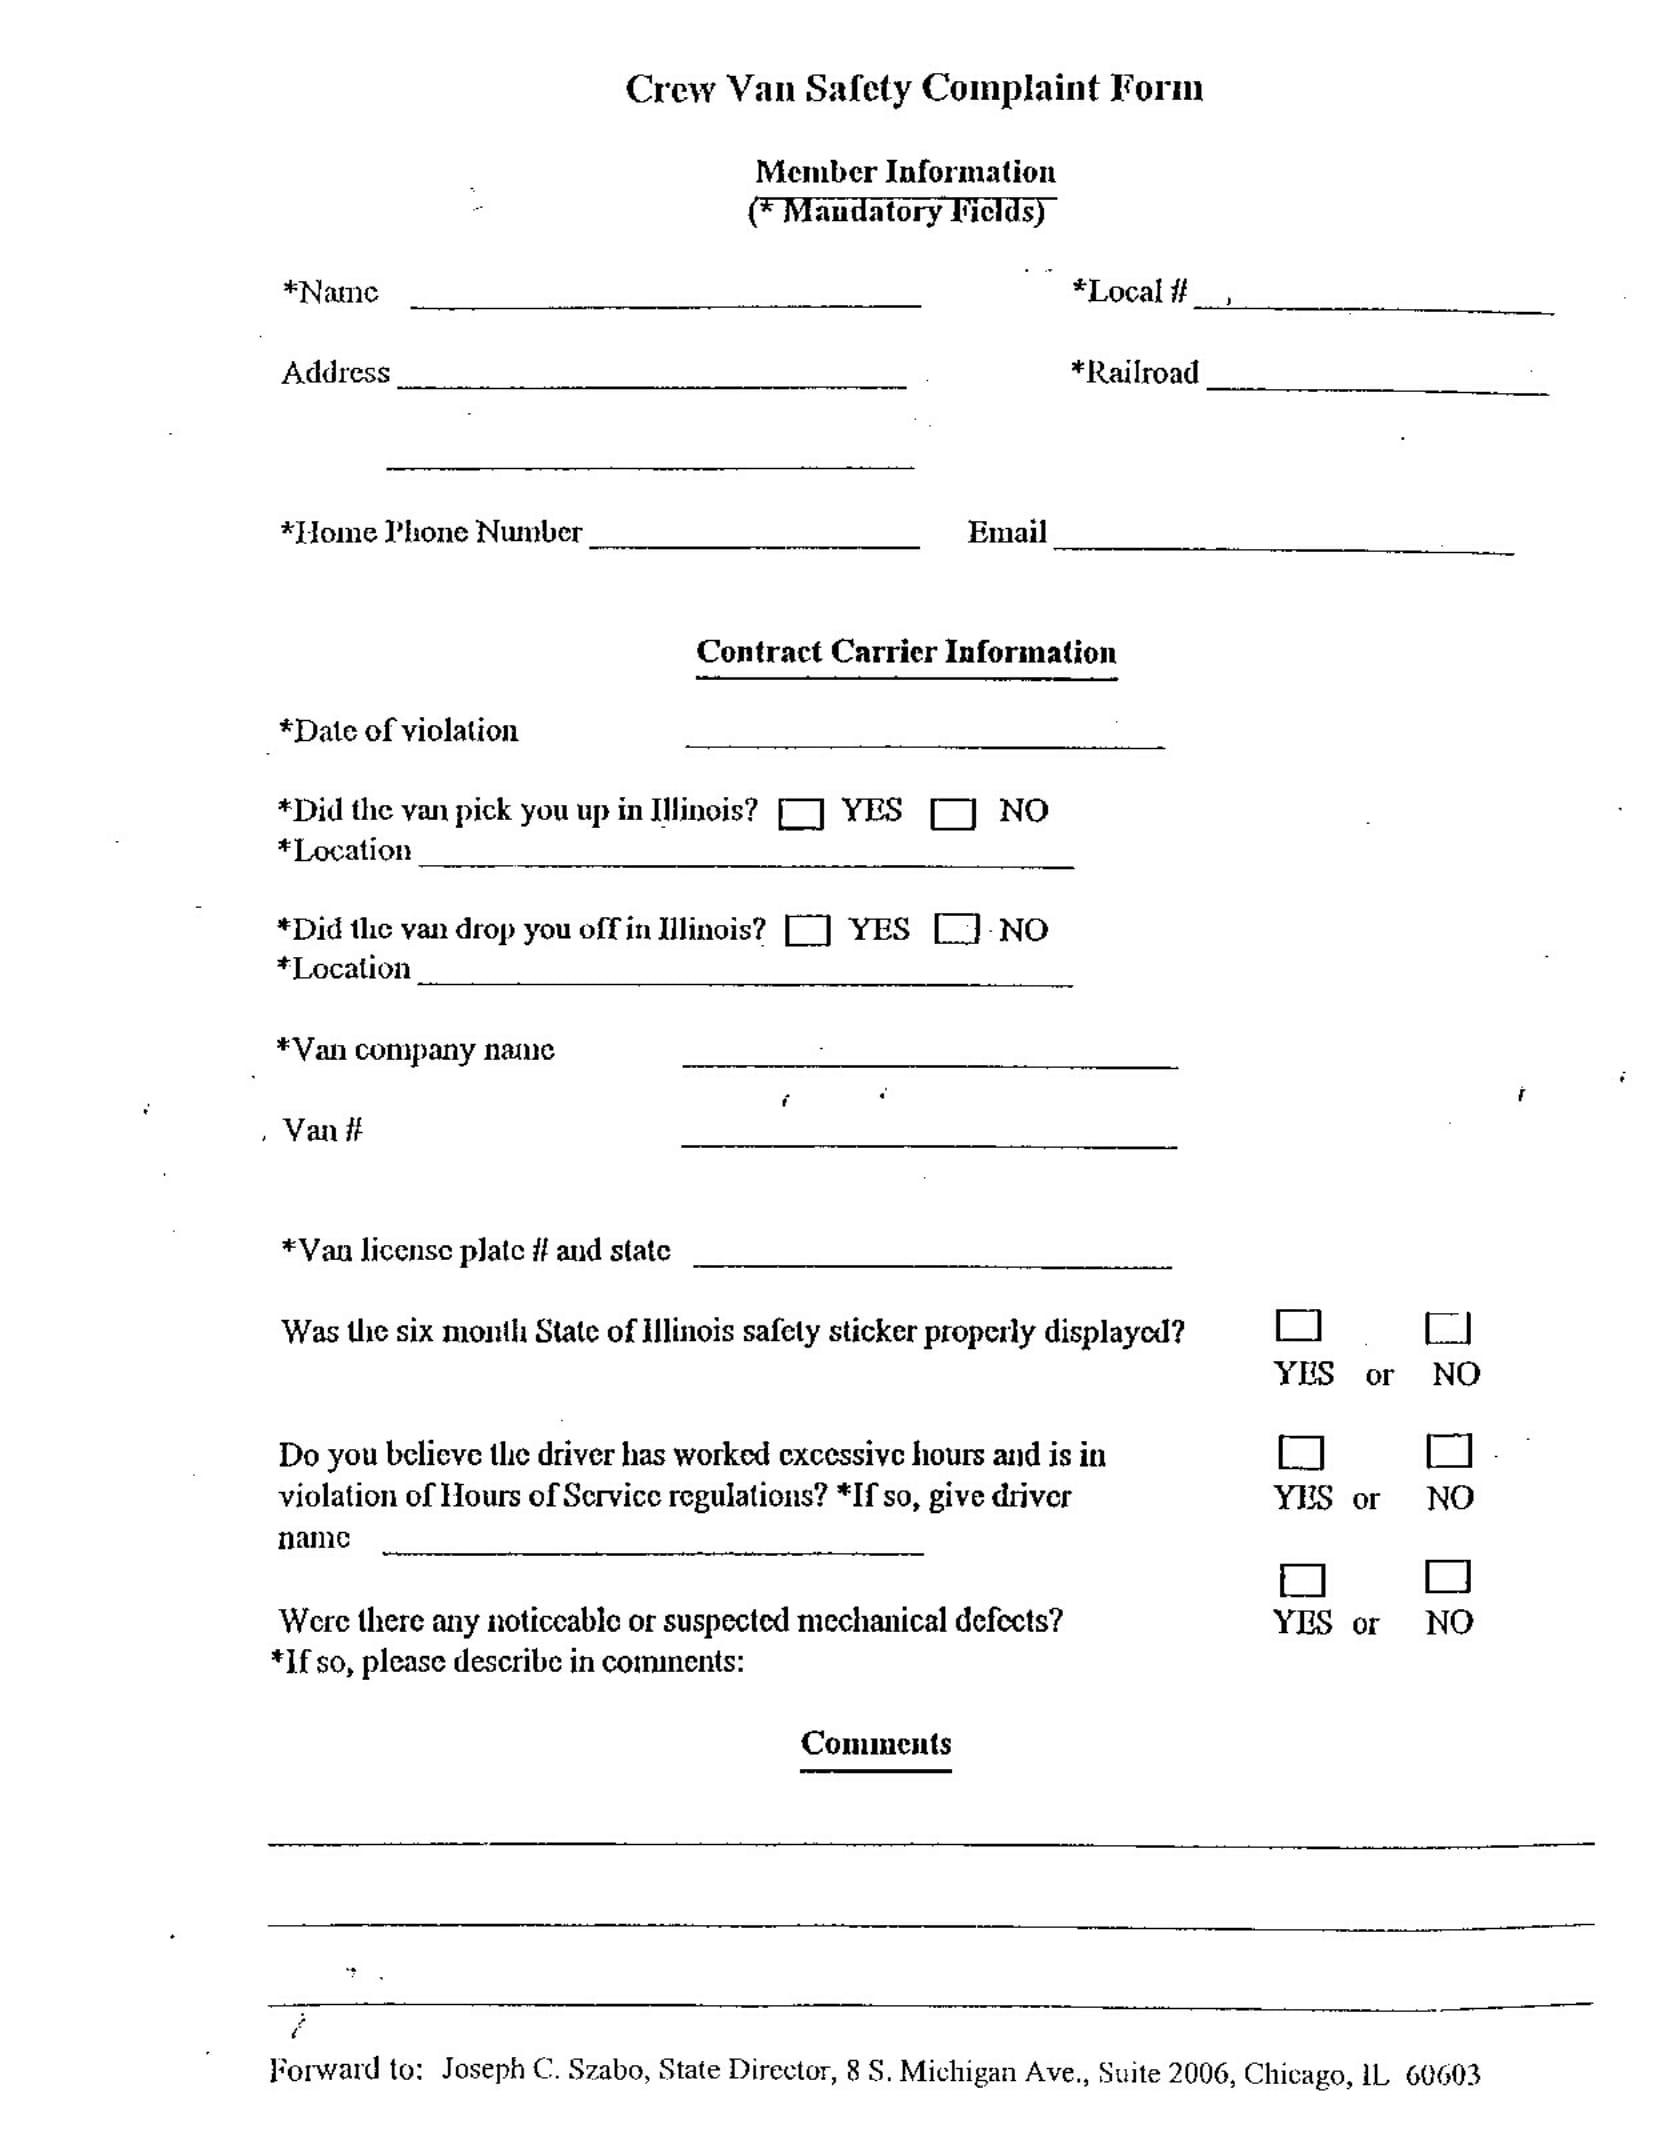 crew van safety complaint form 1